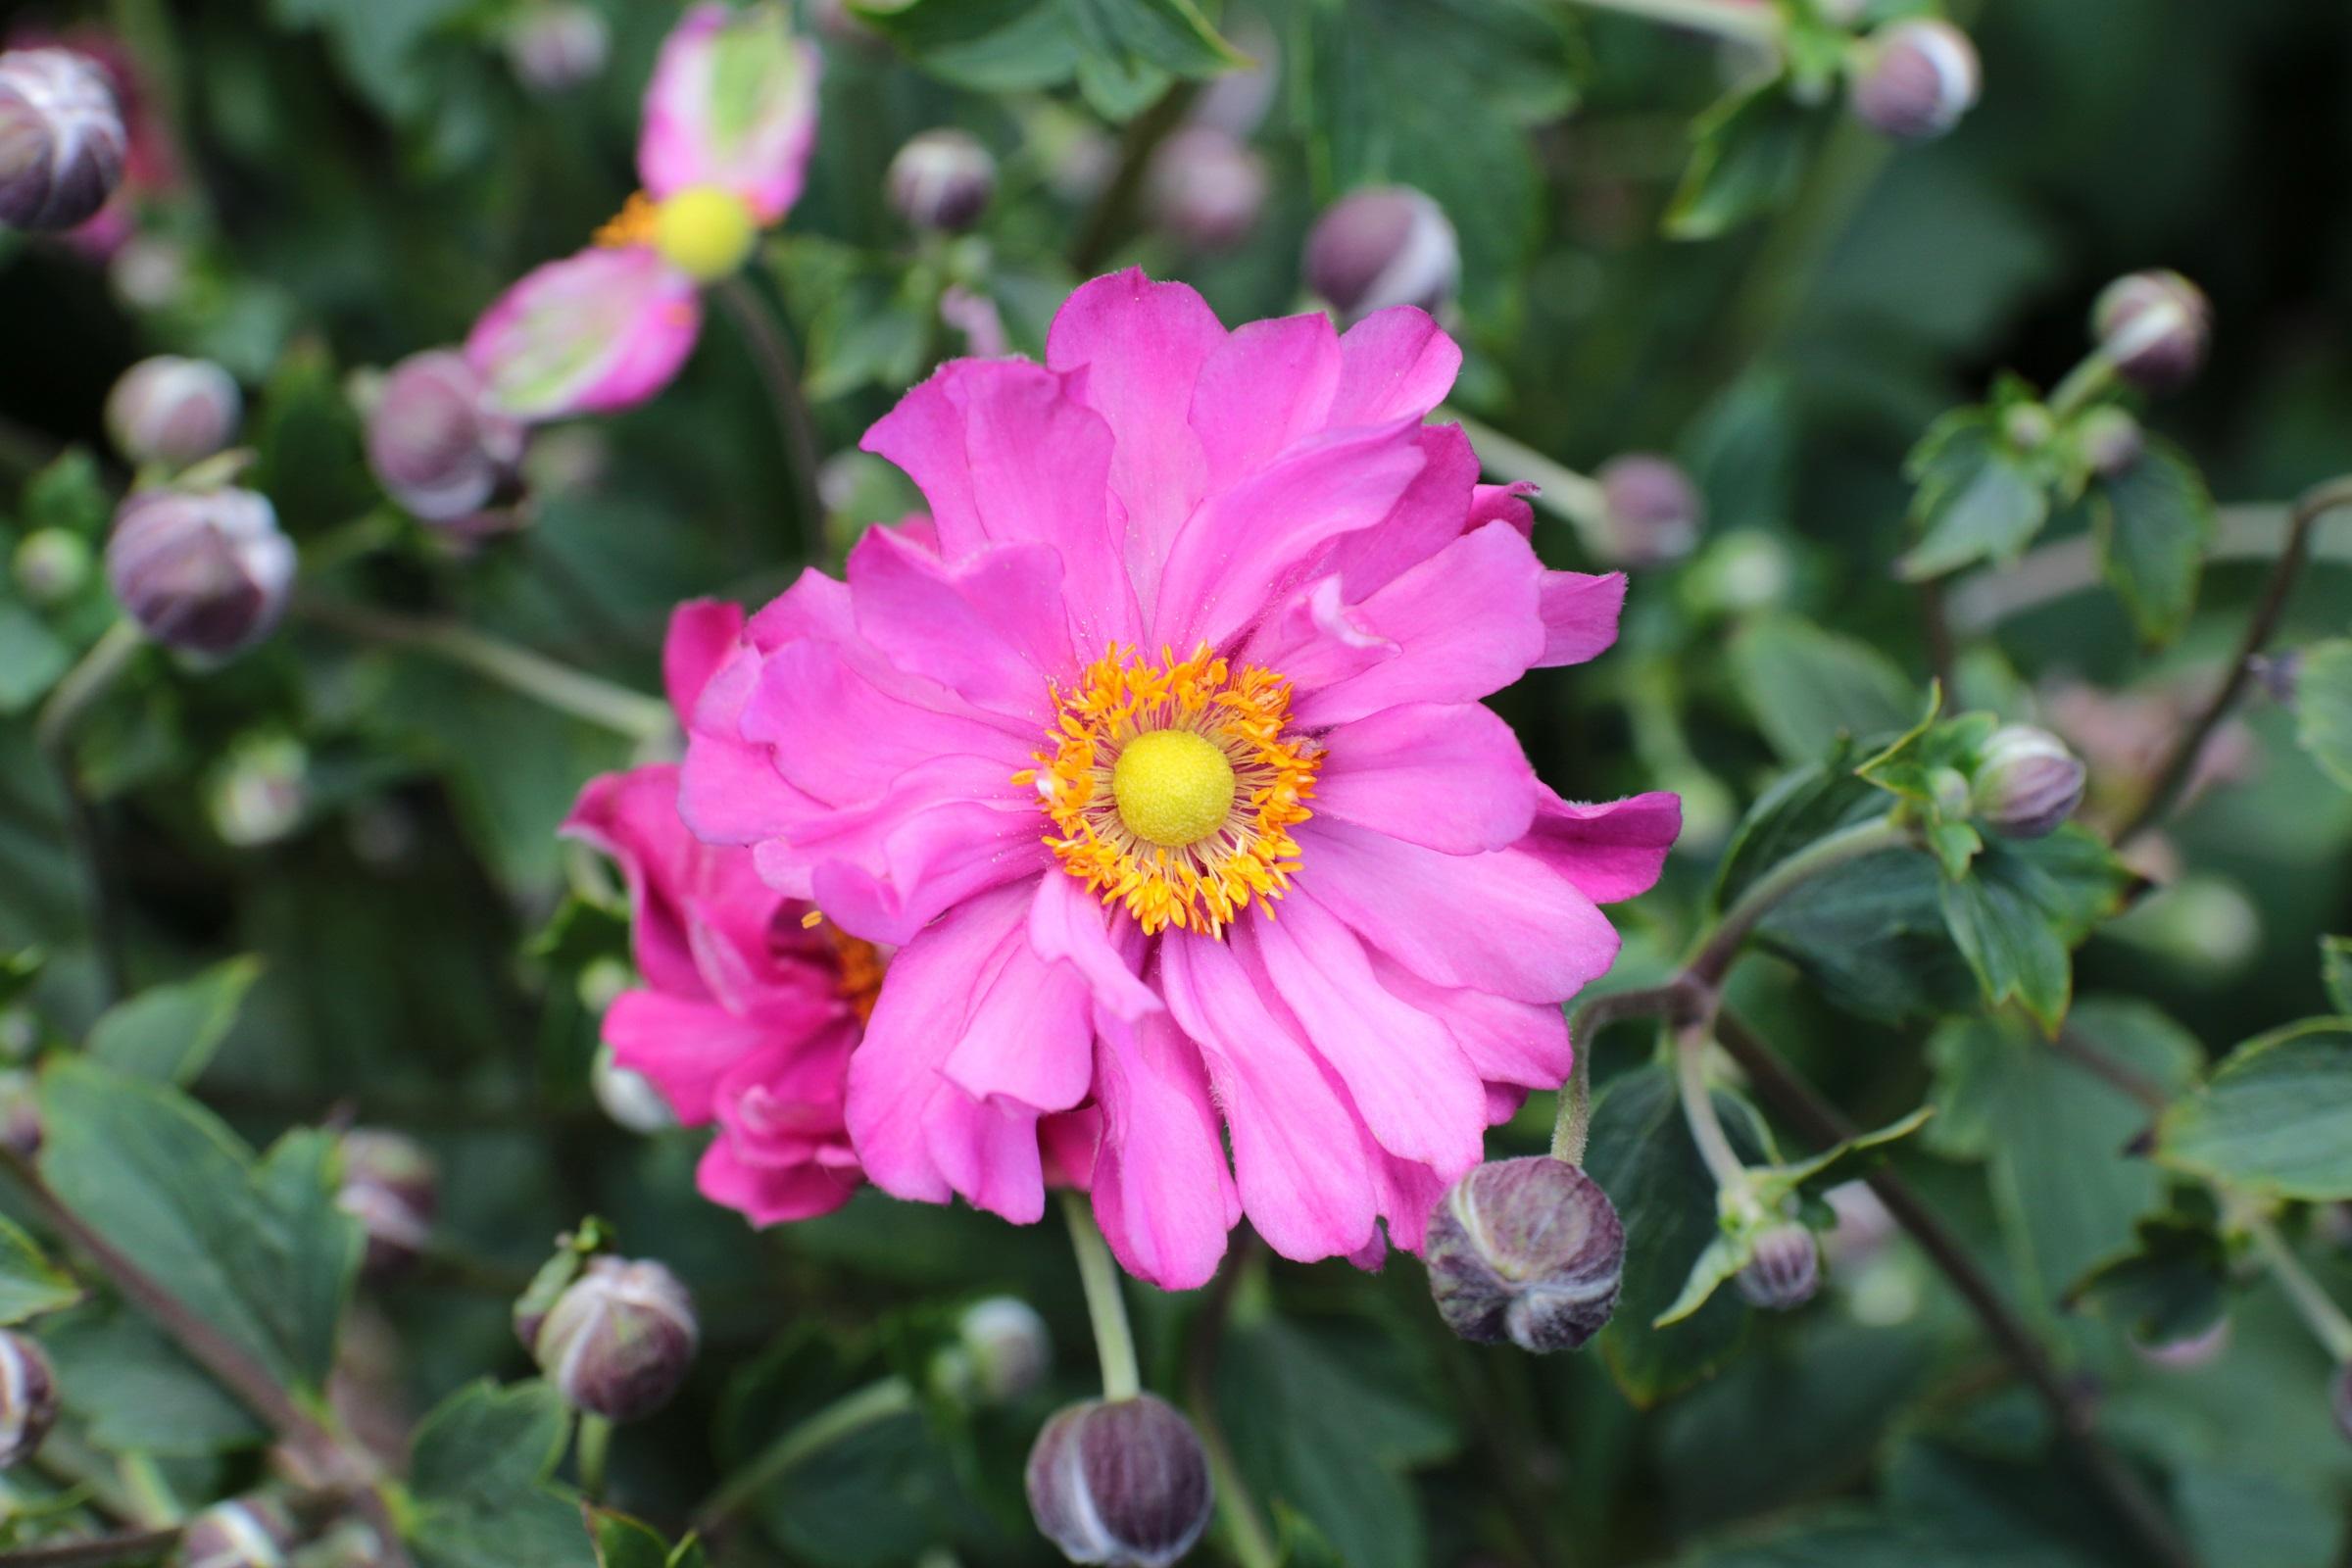 Herbst-Anemone (Anemone japonica) 'Margarete' T19, dunkelrosa - winterhart